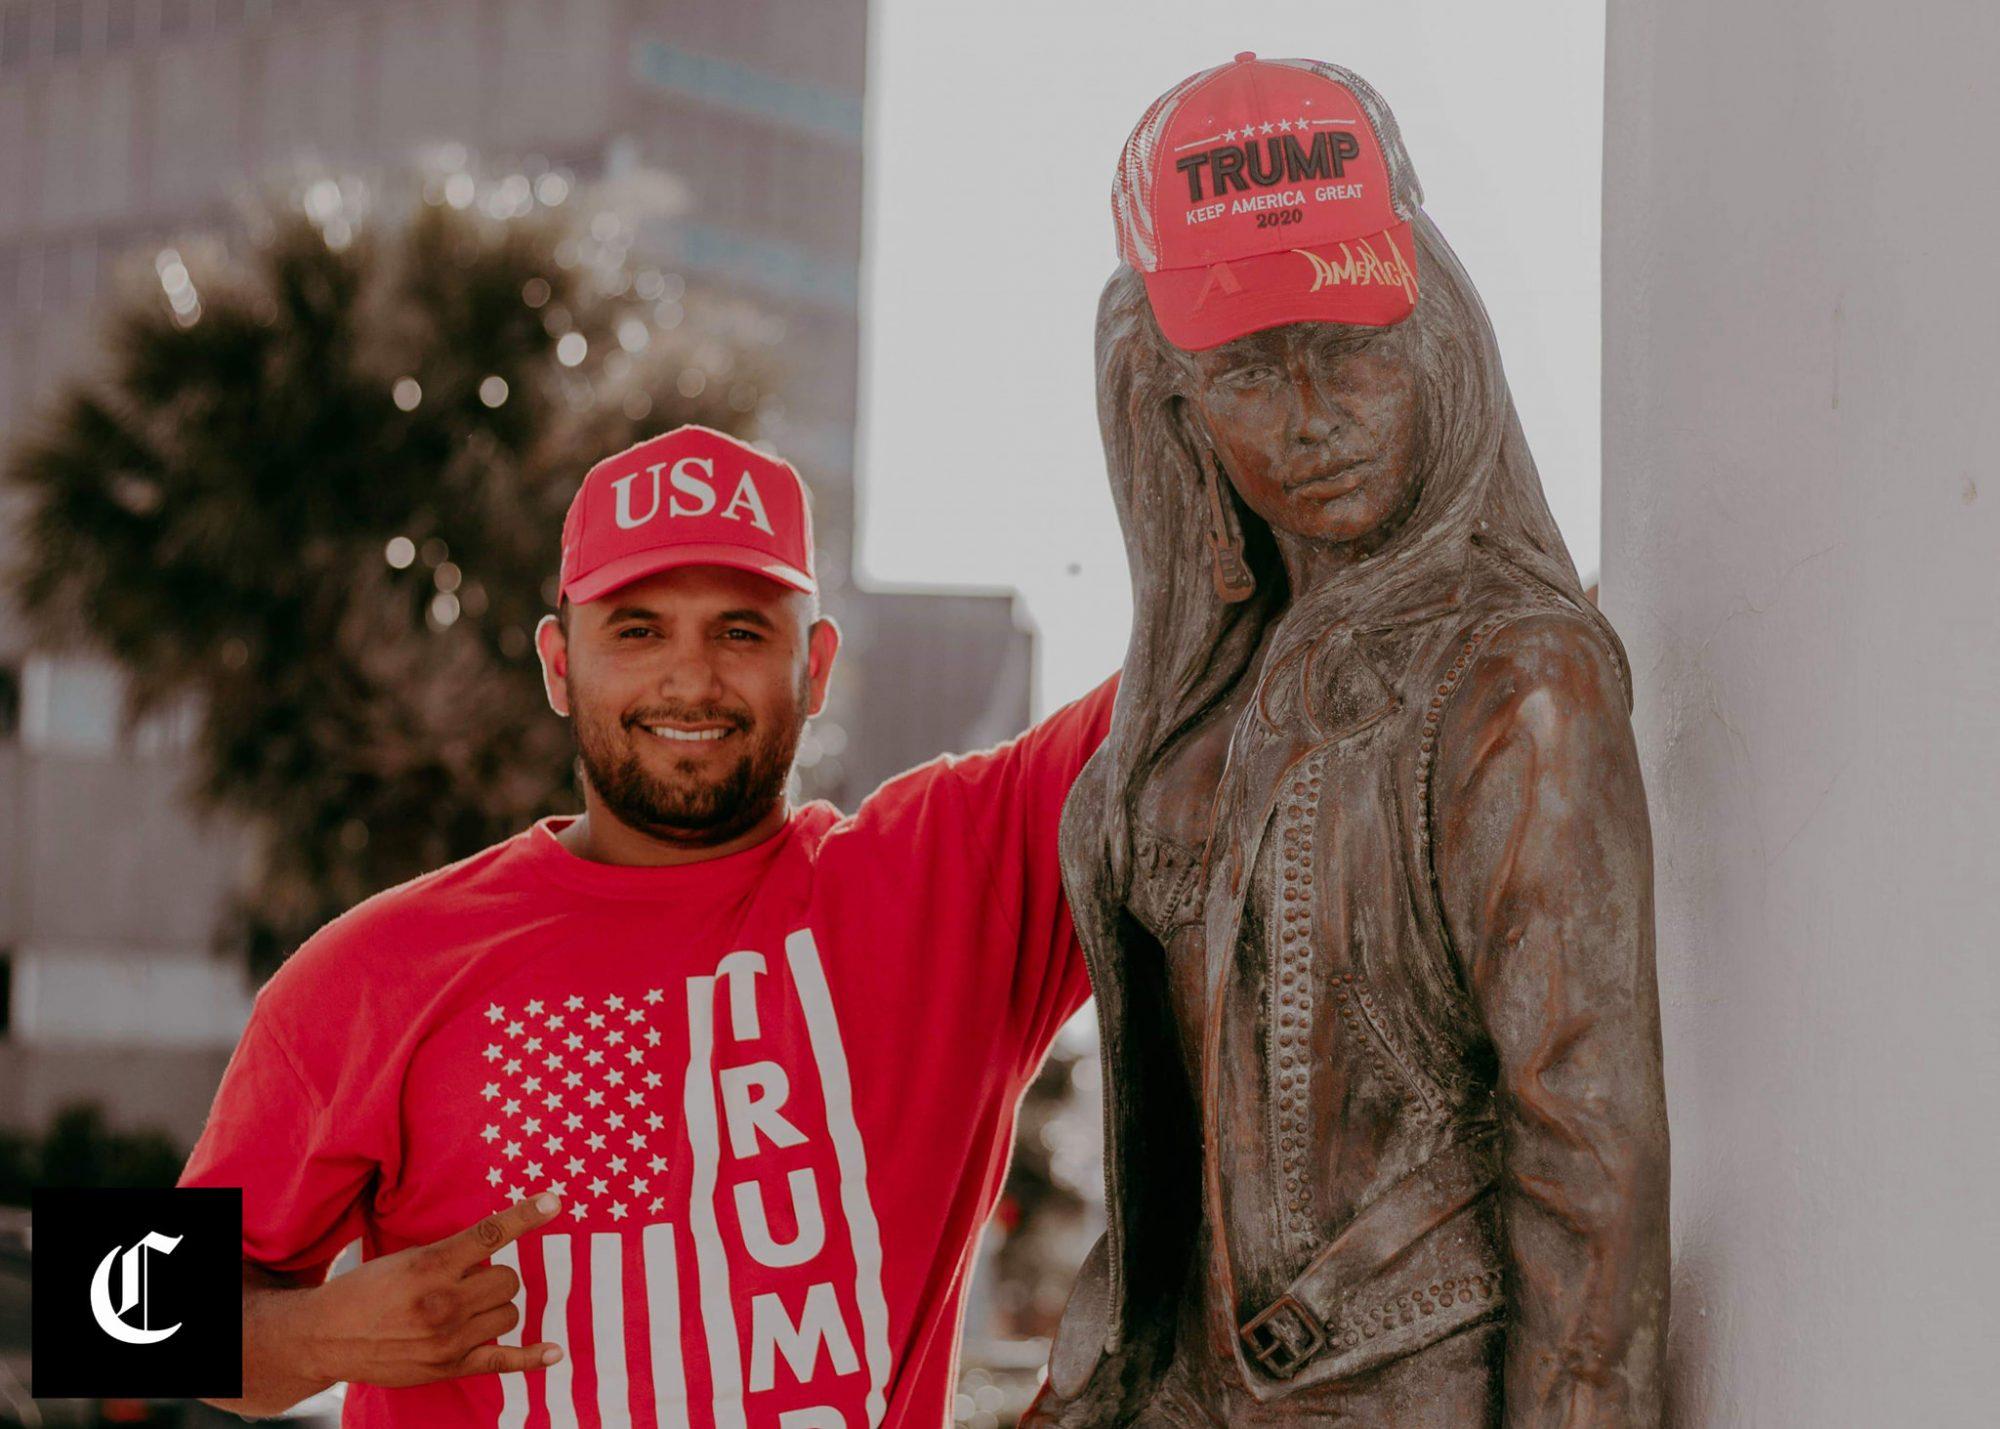 Selena Statue Maga Hat